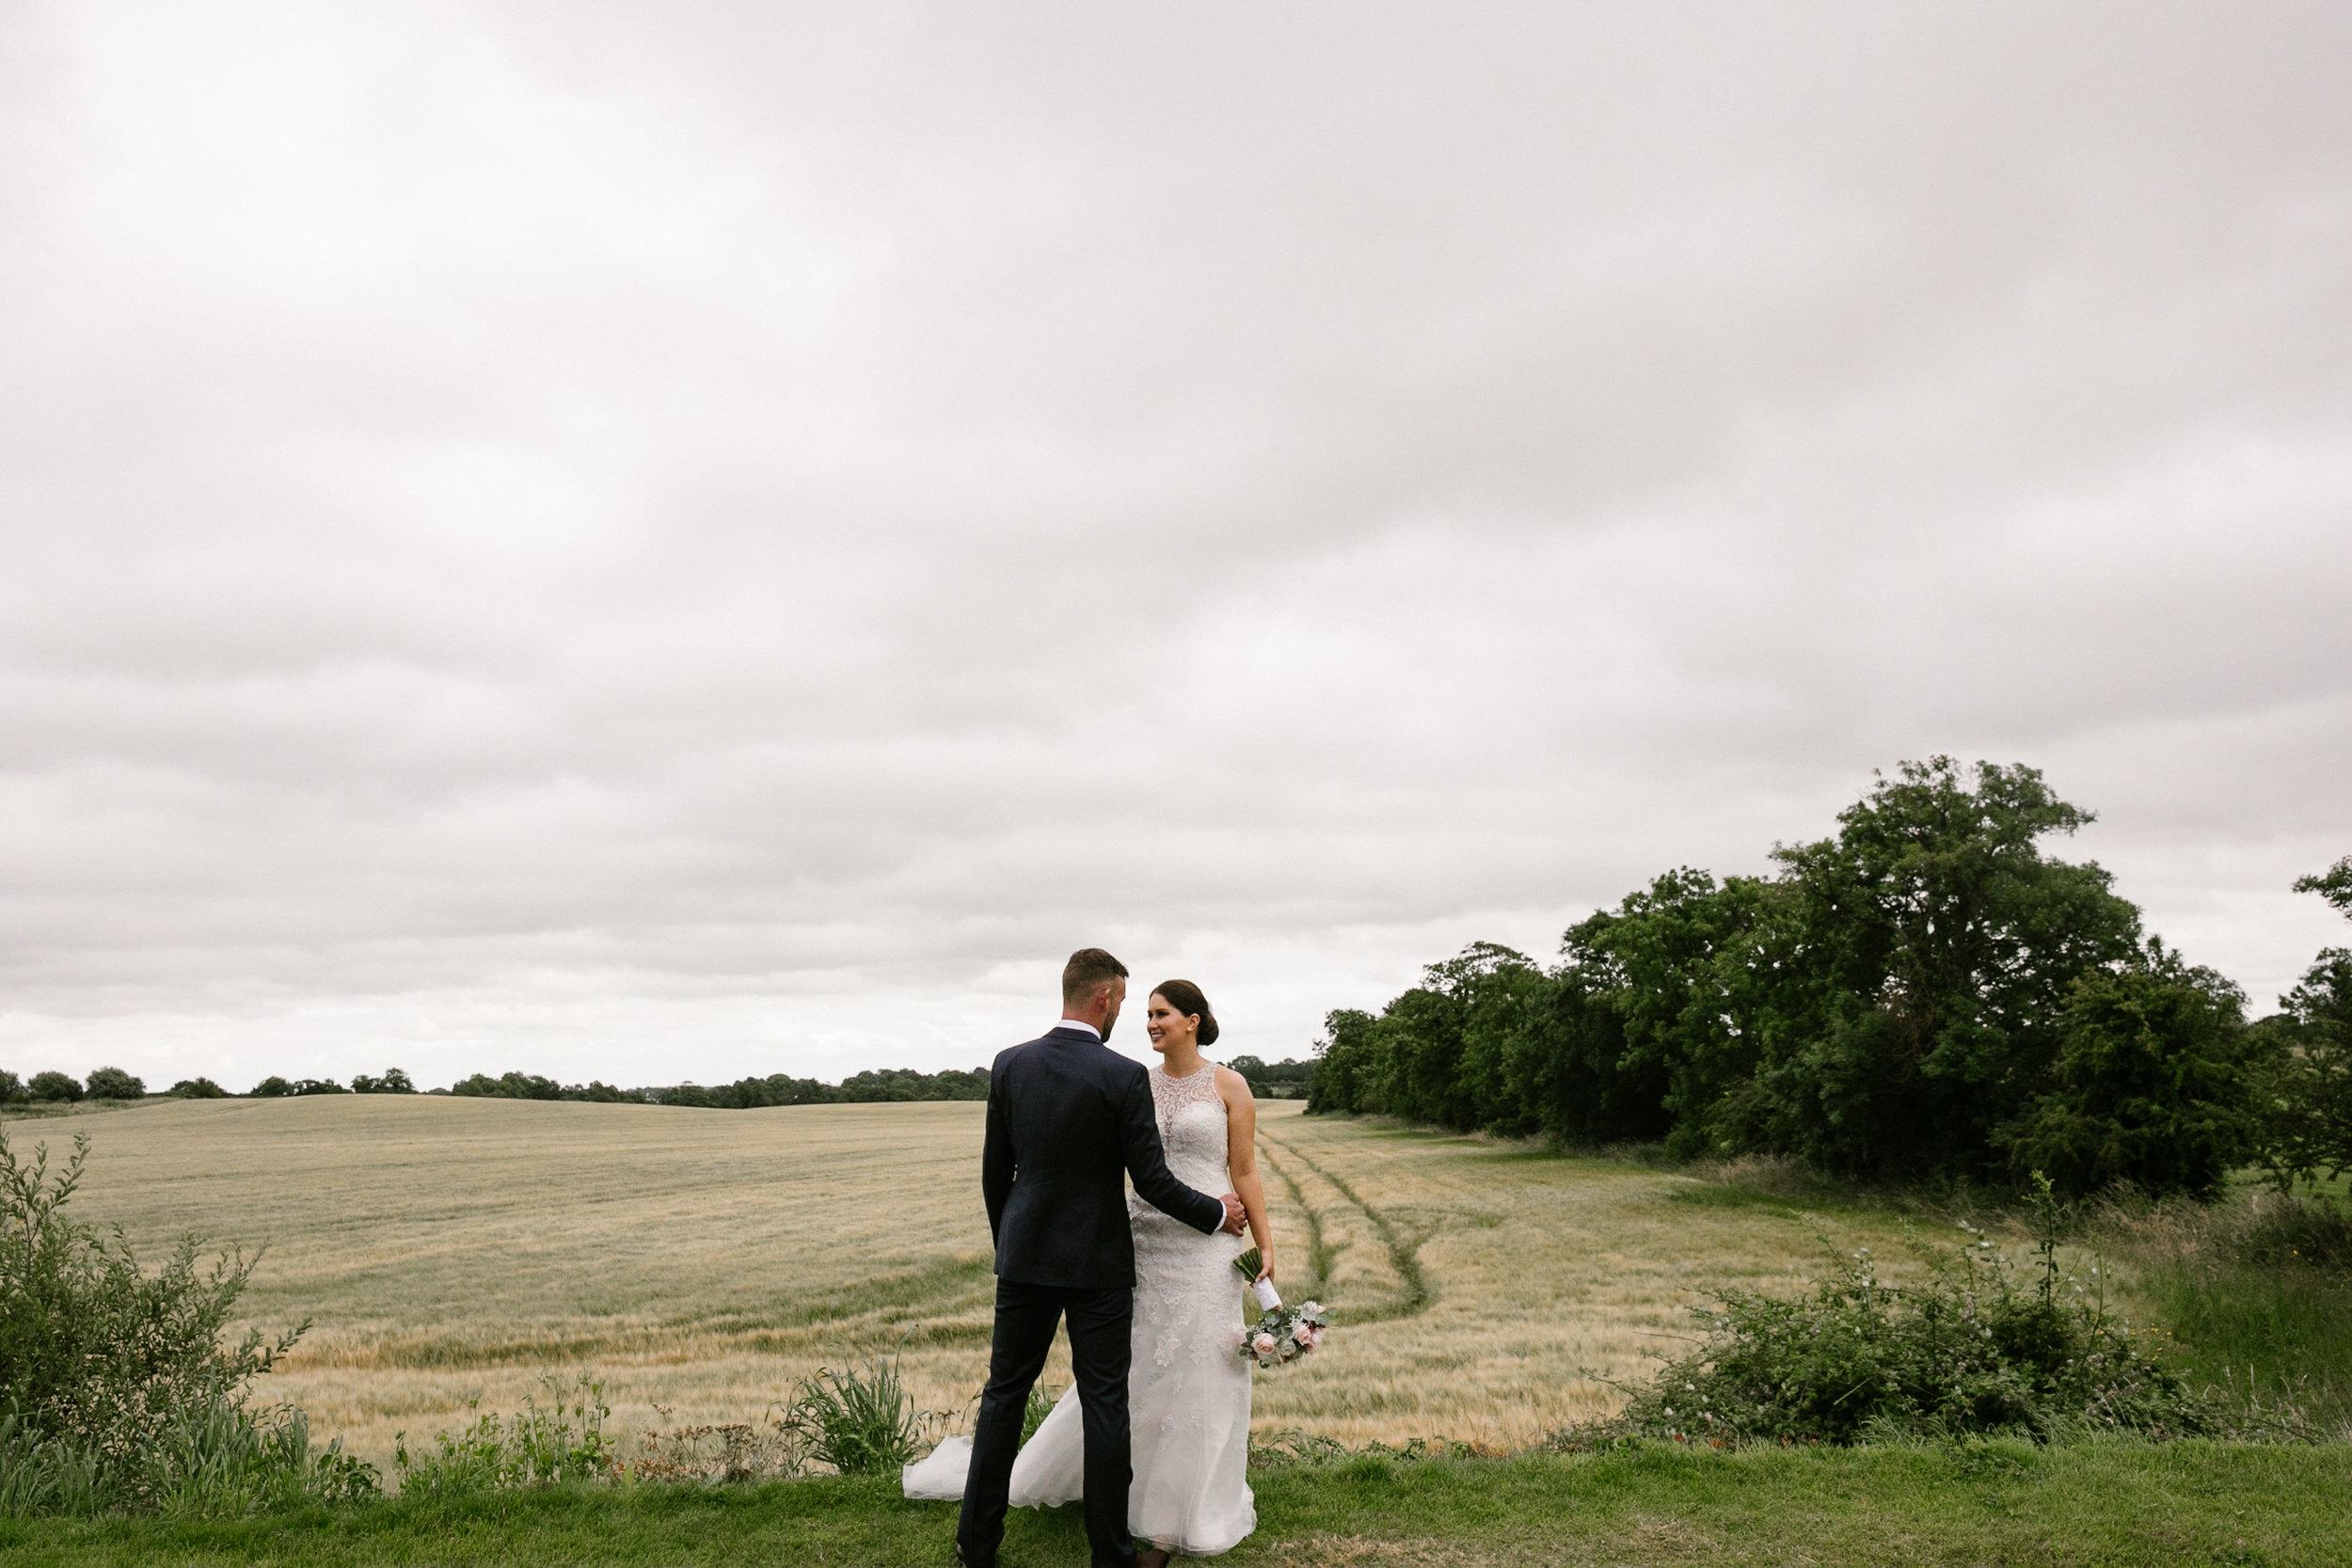 Deyna & Mark // Wedding // Knightsbrook Hotel